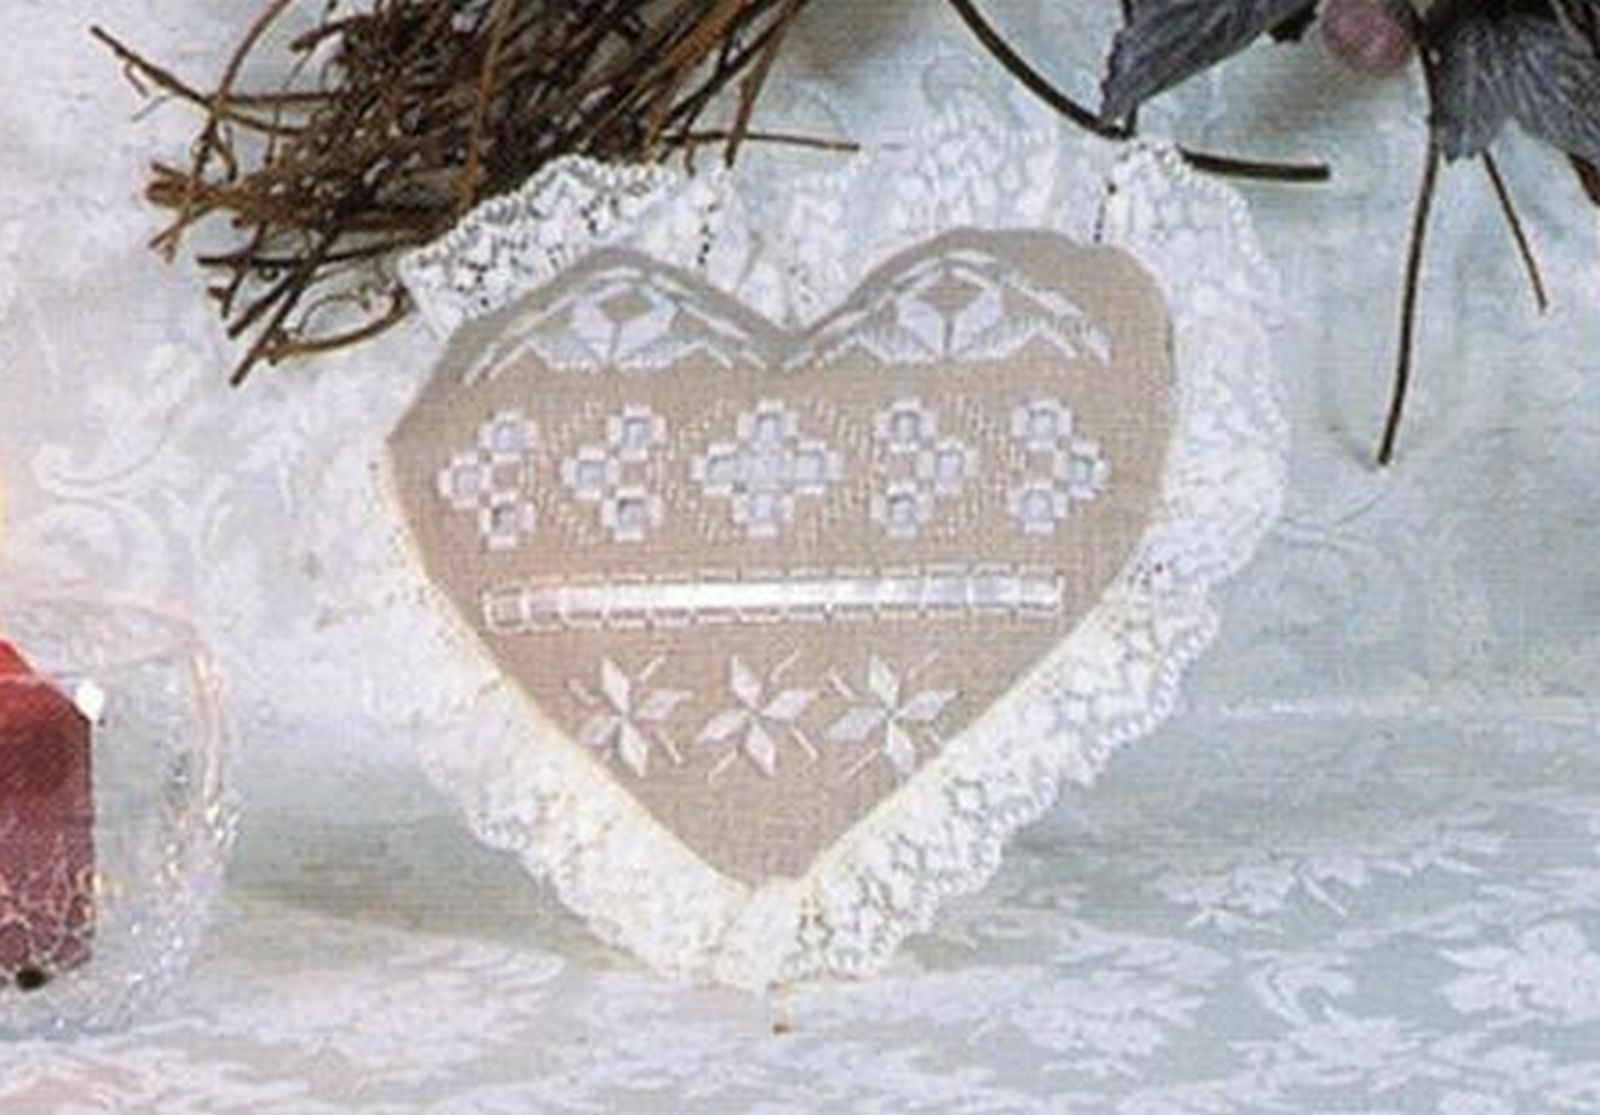 I Love Autumn Hardanger Embroidery Seasonal Sampler Rosalyn Watnemo Book image 6